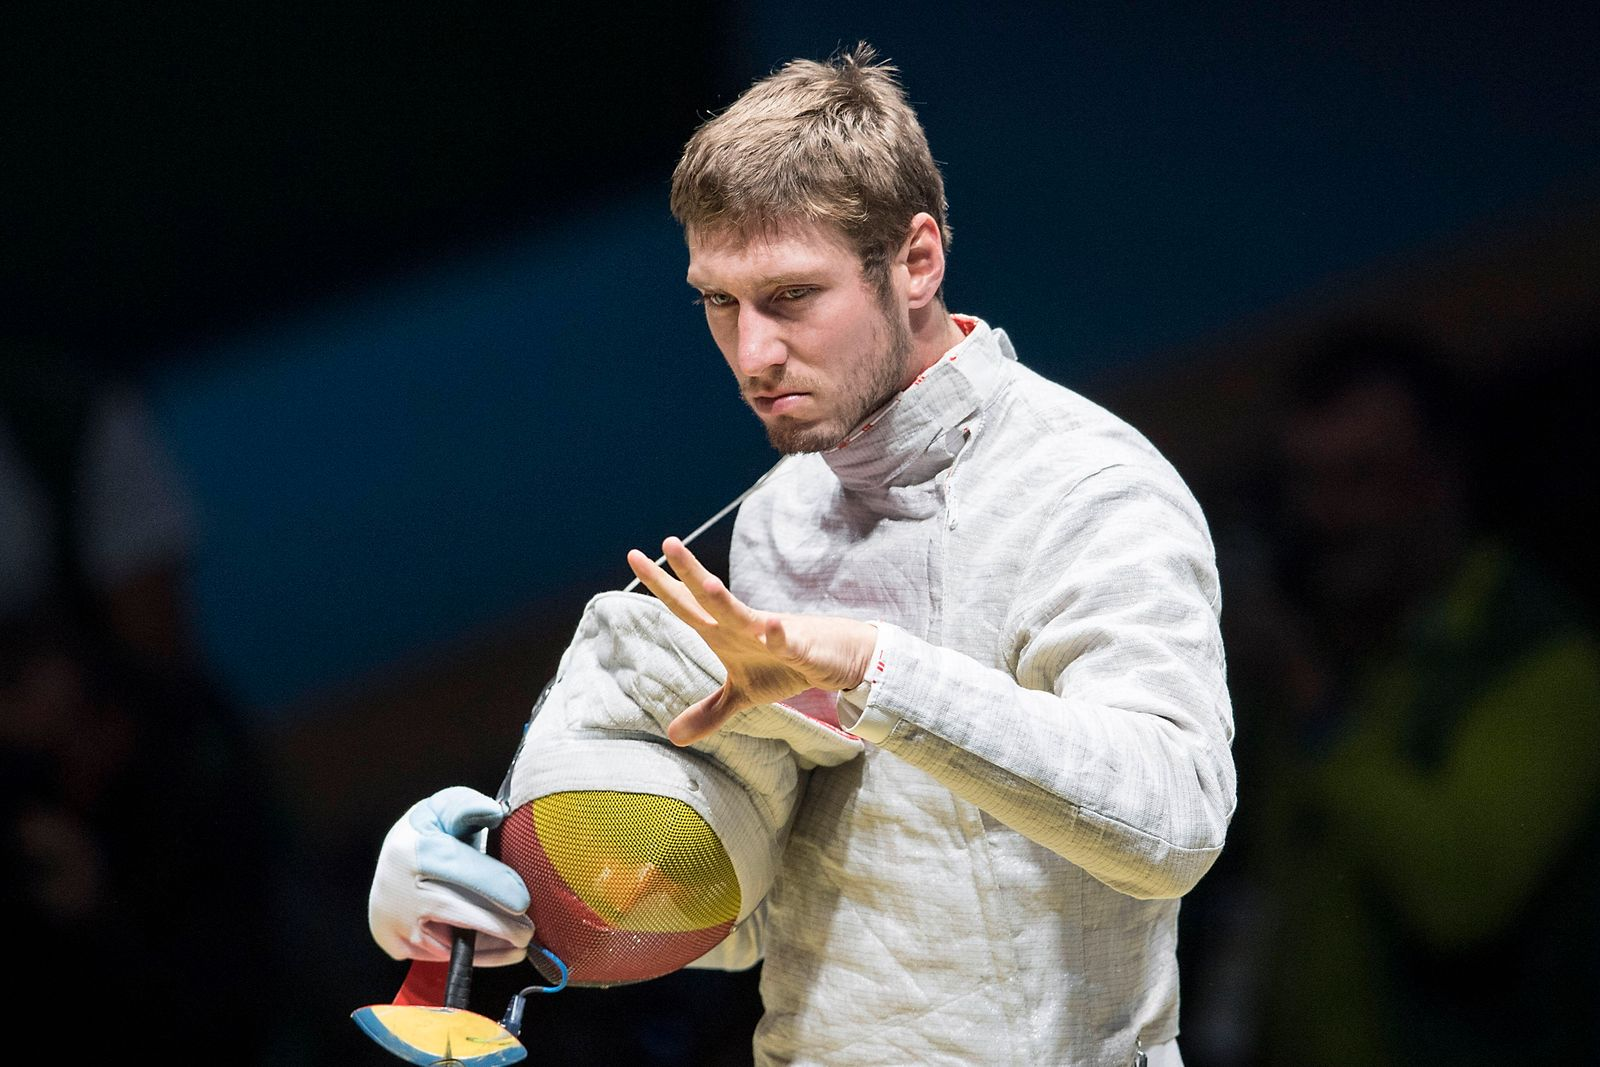 Fecht Europameister kuendigt Olympia-Boykott an. Max Hartung: Der Fecht-Europameister wird seinen Sommer nicht in Tokio